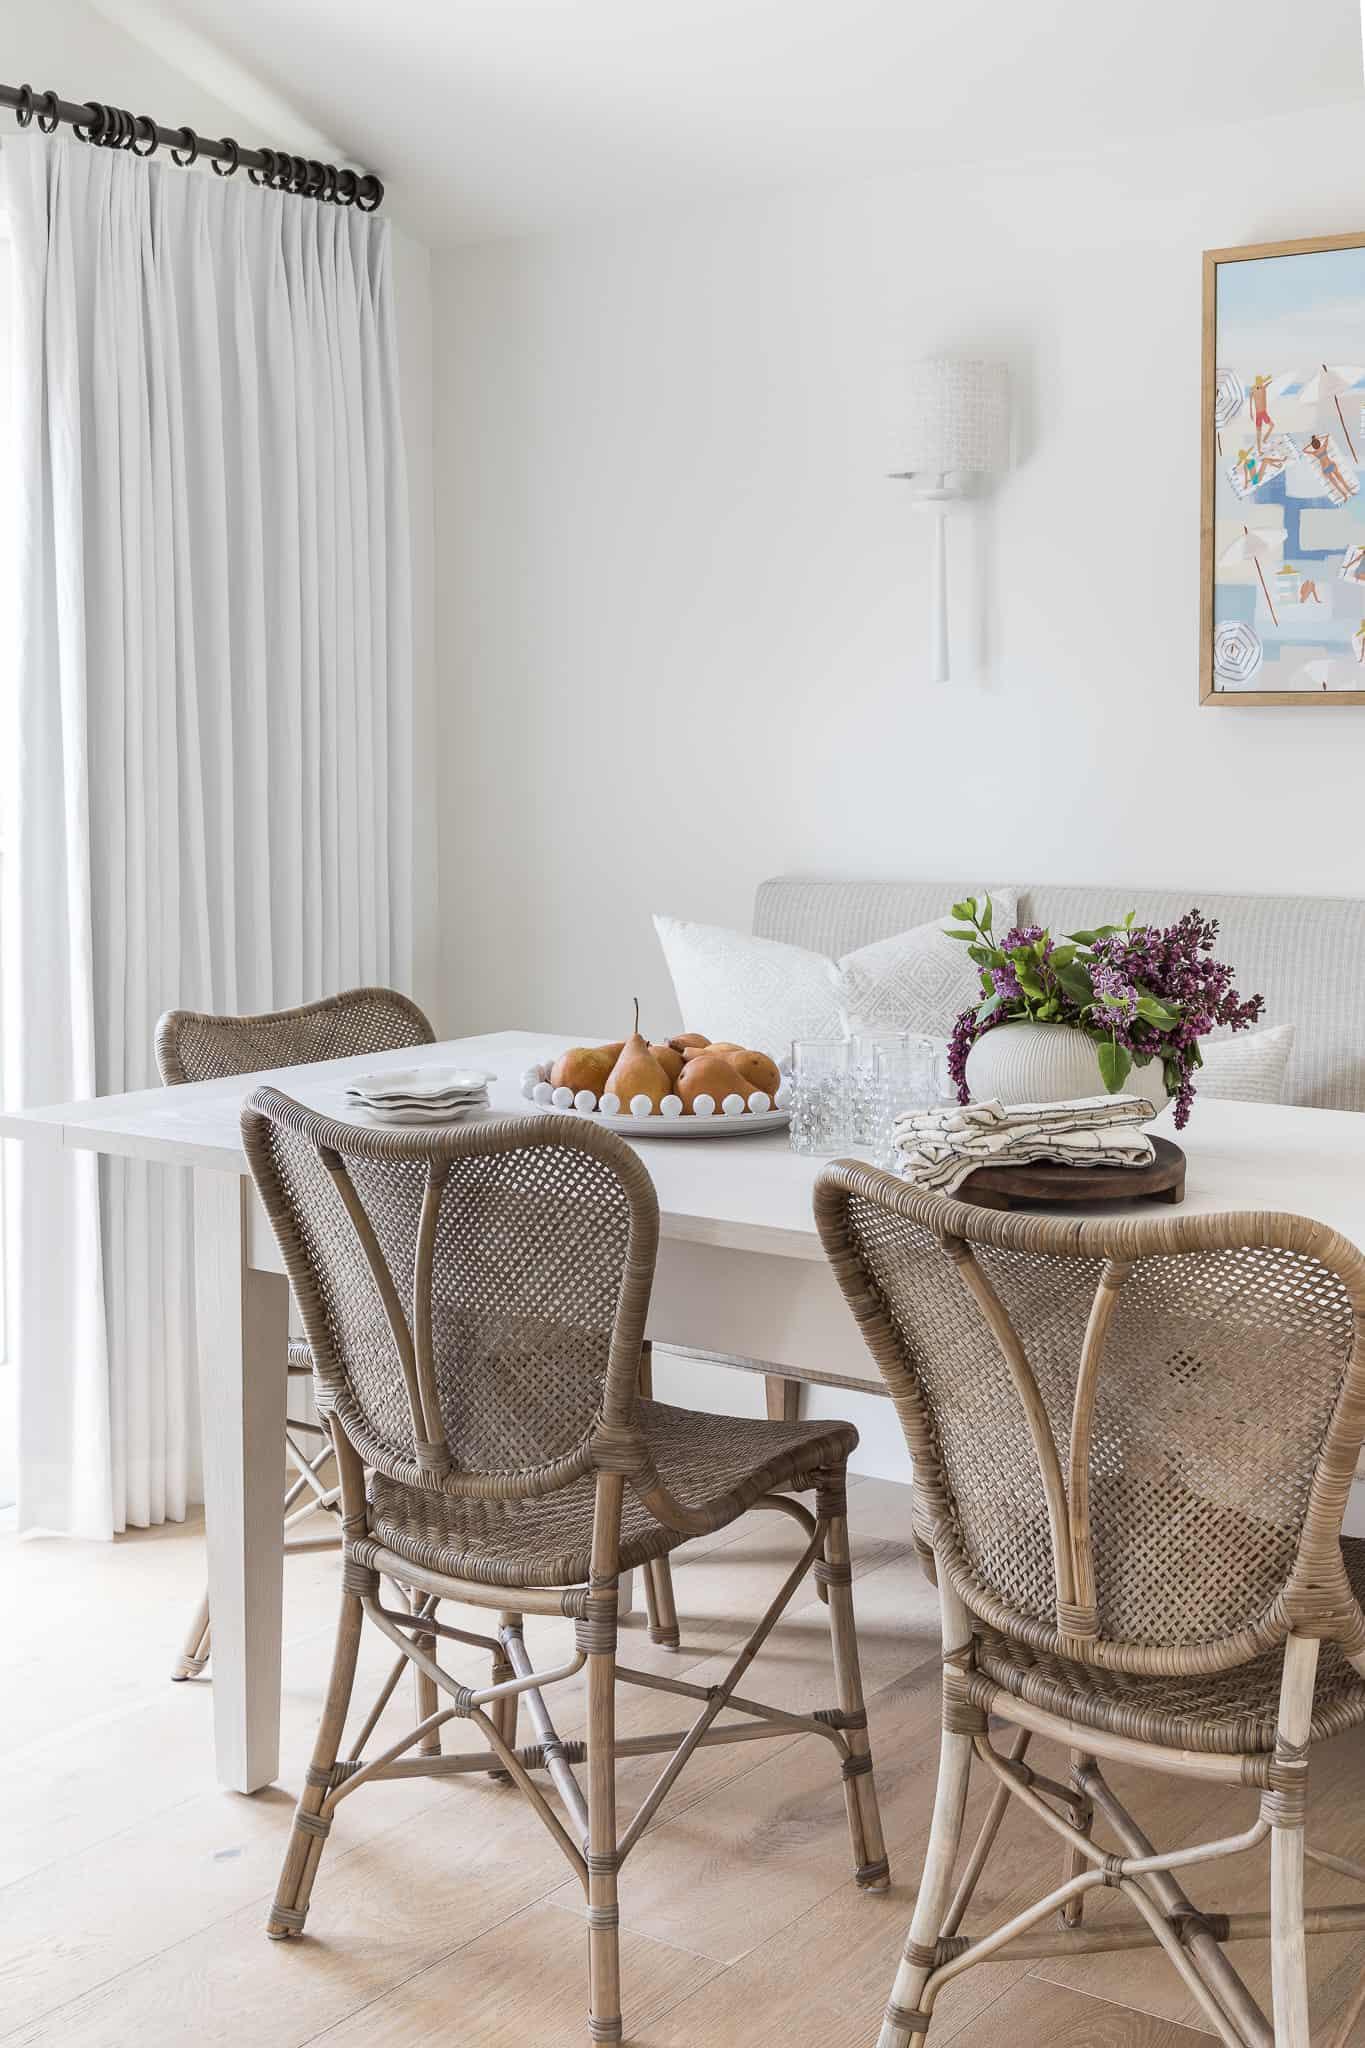 Coastal Home Design - Kitchen Nook - Mindy Gayer Design Co.